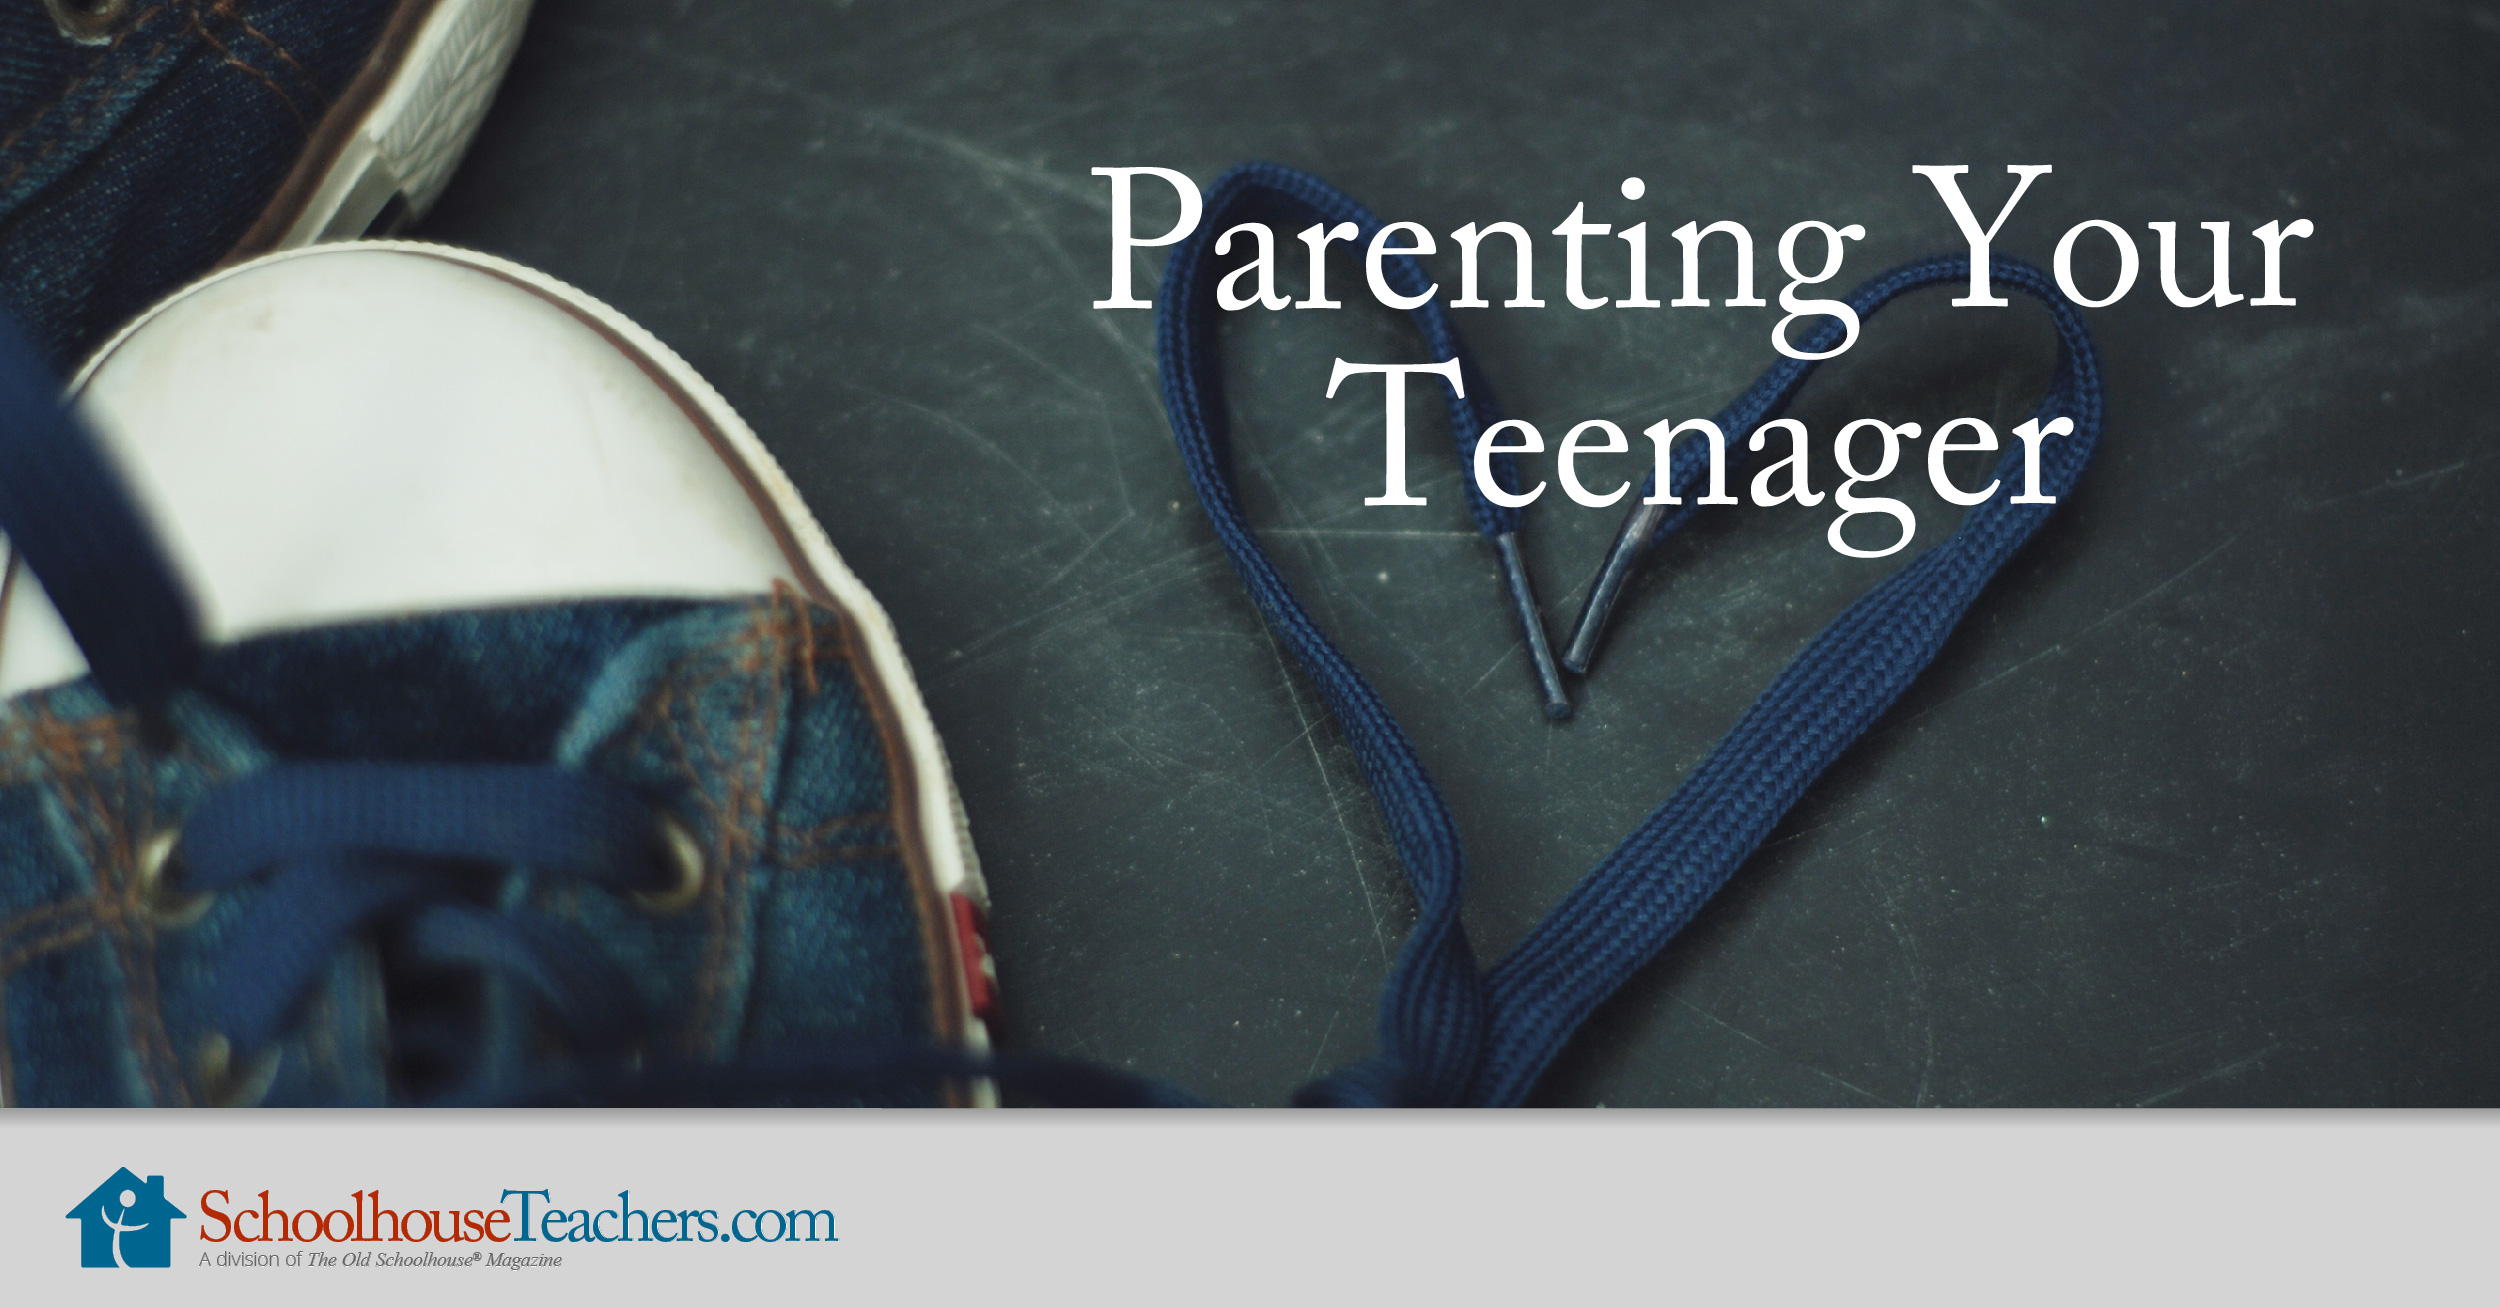 Parenting Your Teenager Course - HomeschoolTeachers com